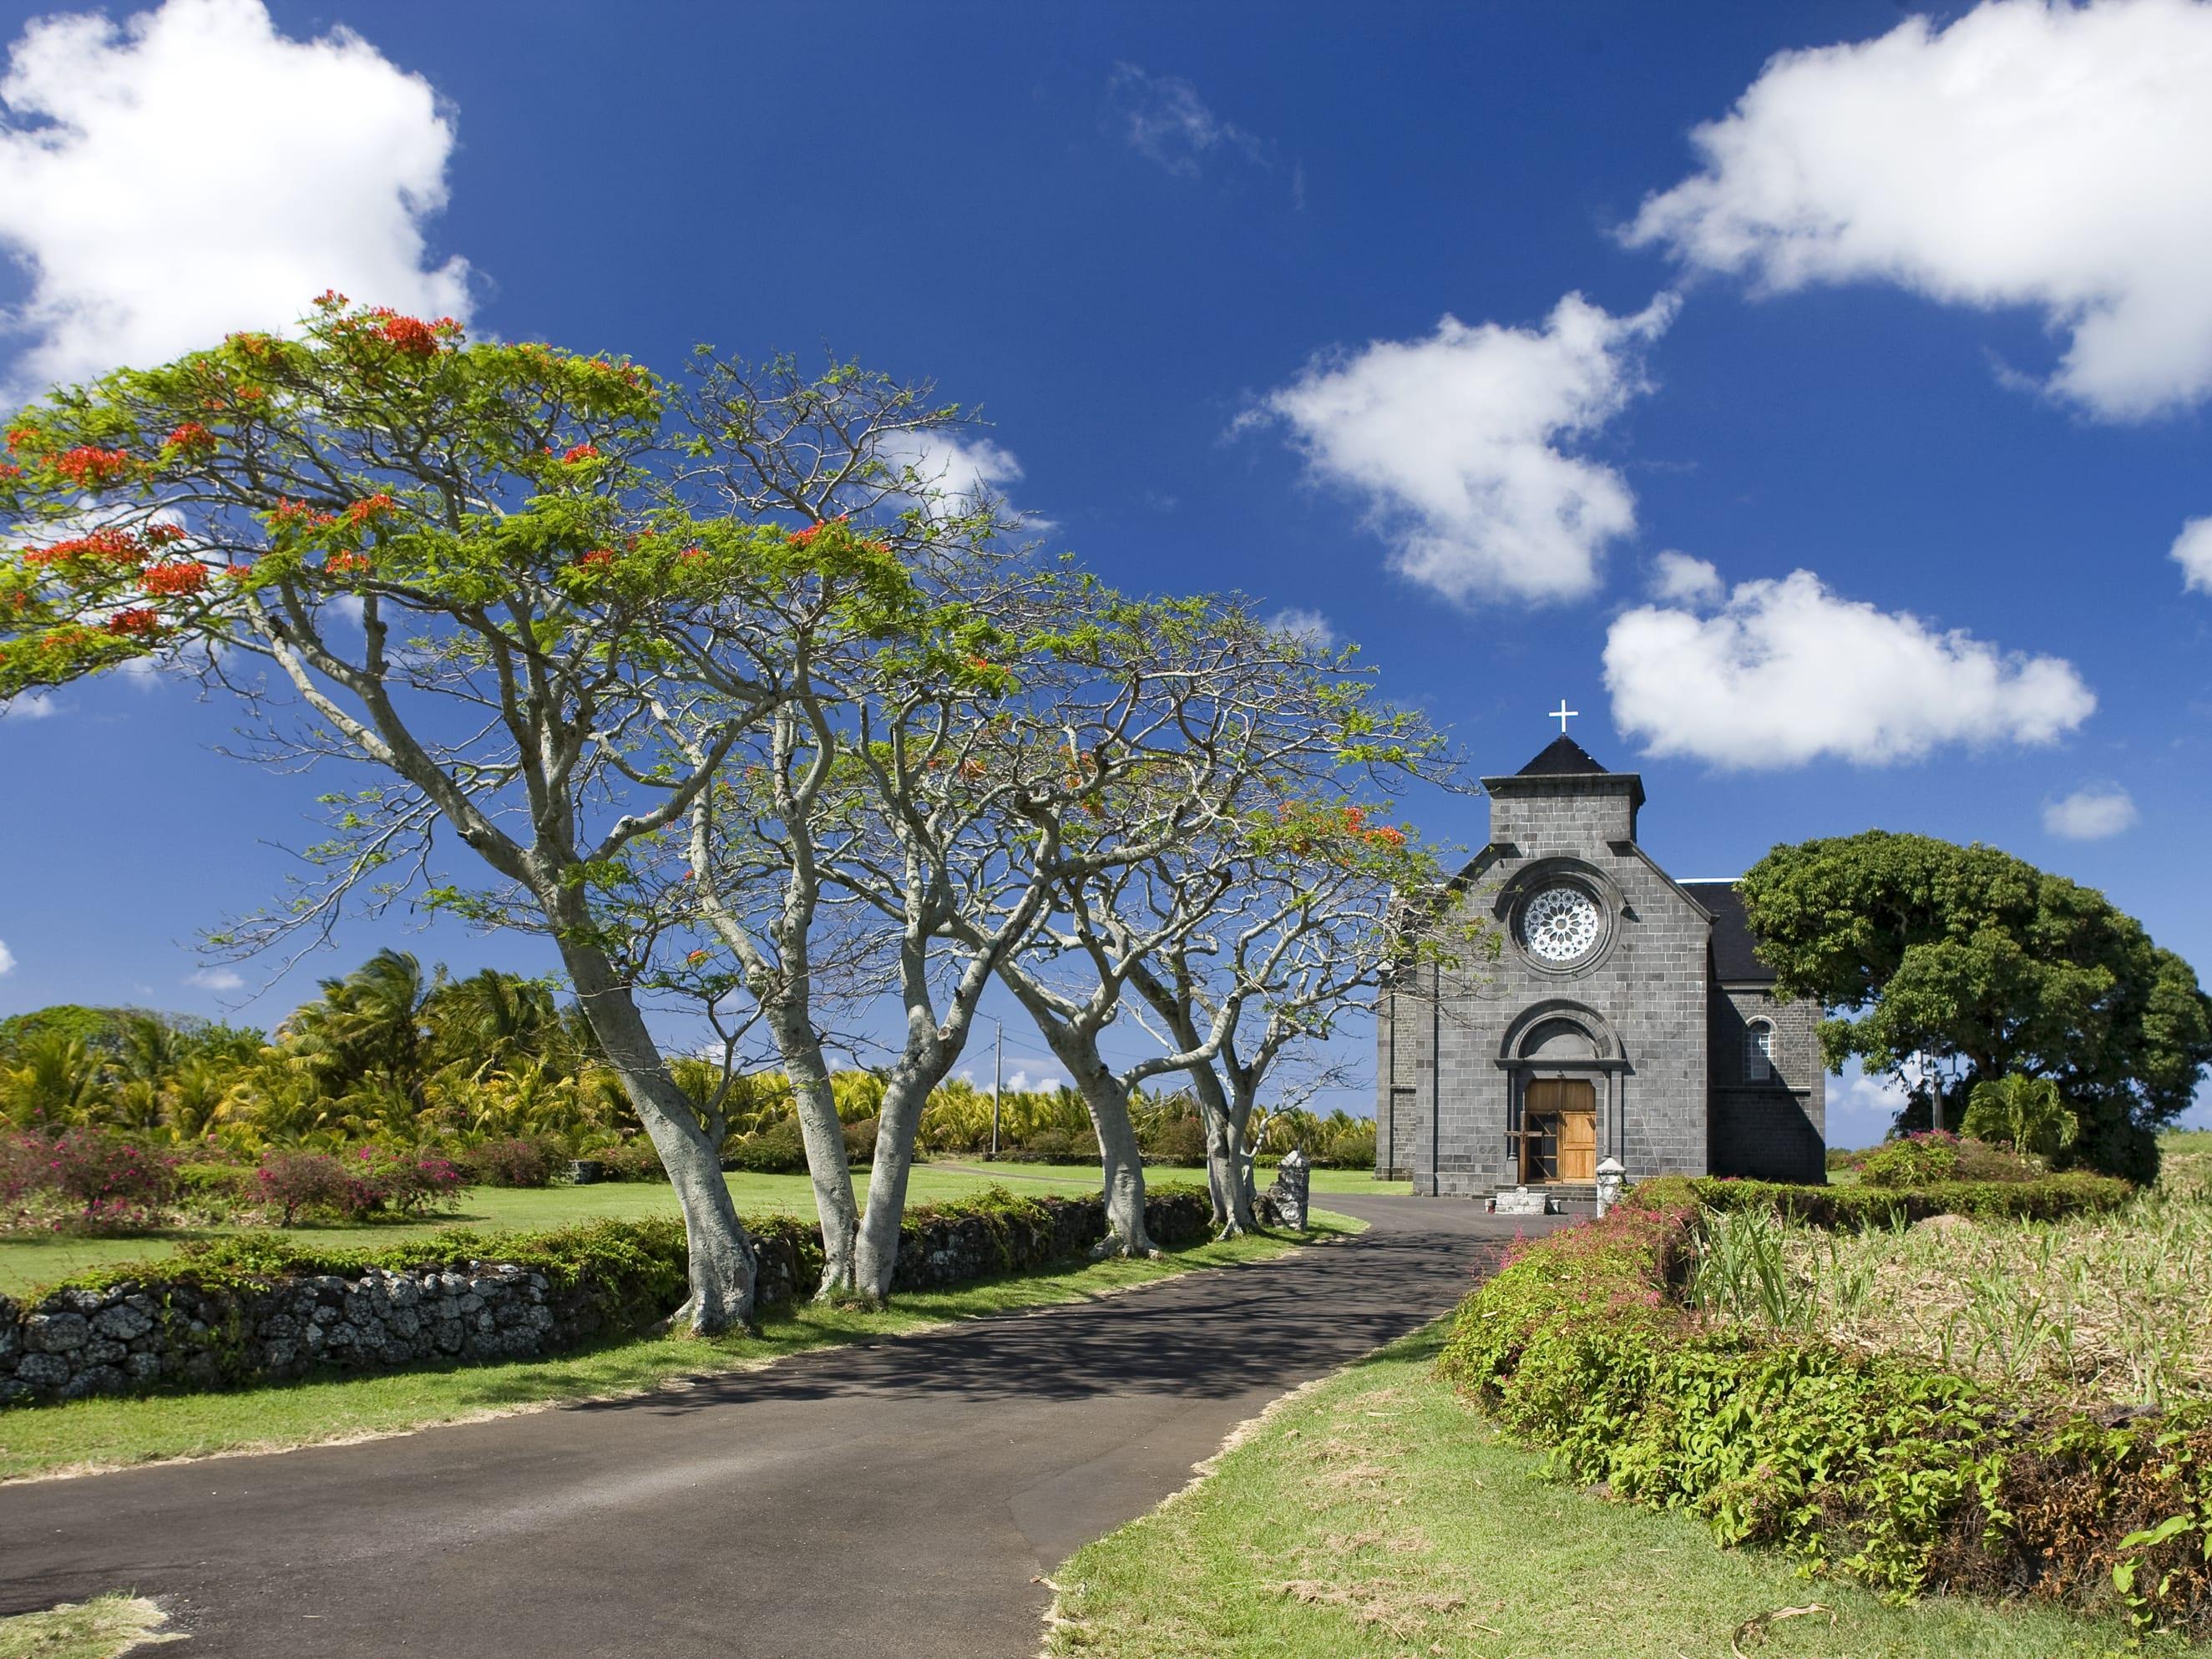 Office du tourisme de l 39 ile maurice maurice c 39 est un plaisir mynewsdesk - Ile maurice office du tourisme ...